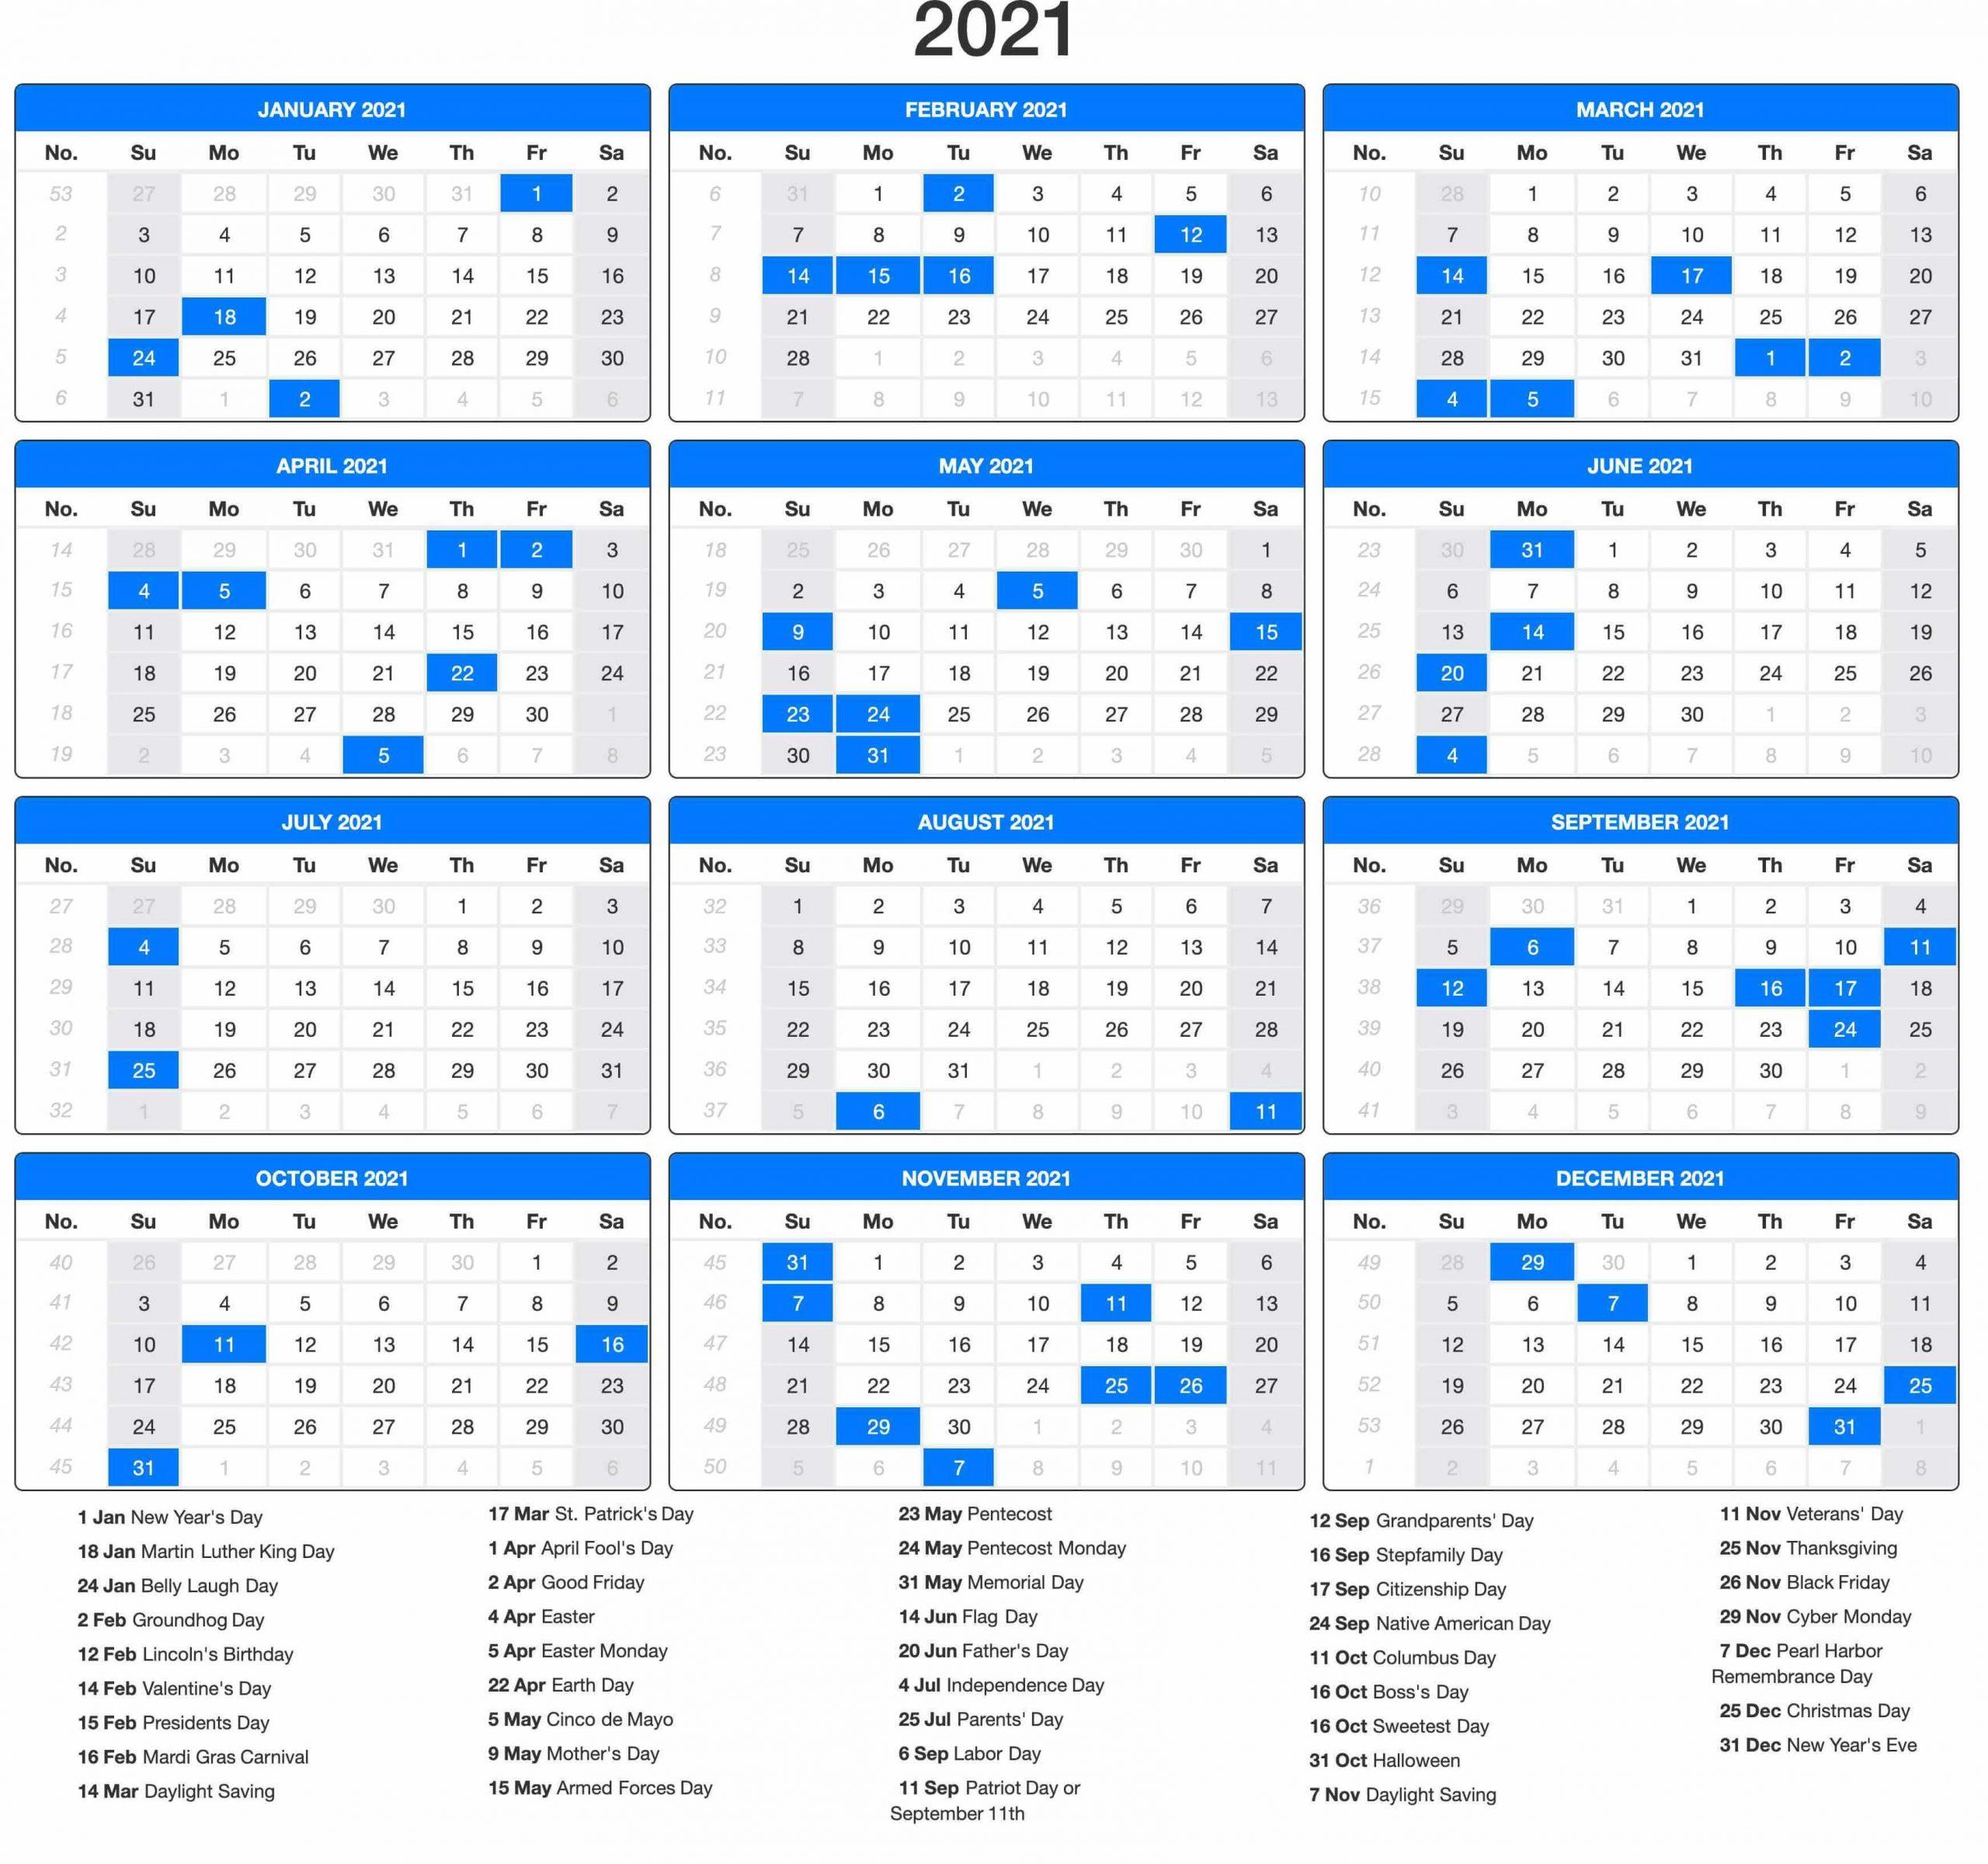 Calendar Year 2021 Holidays